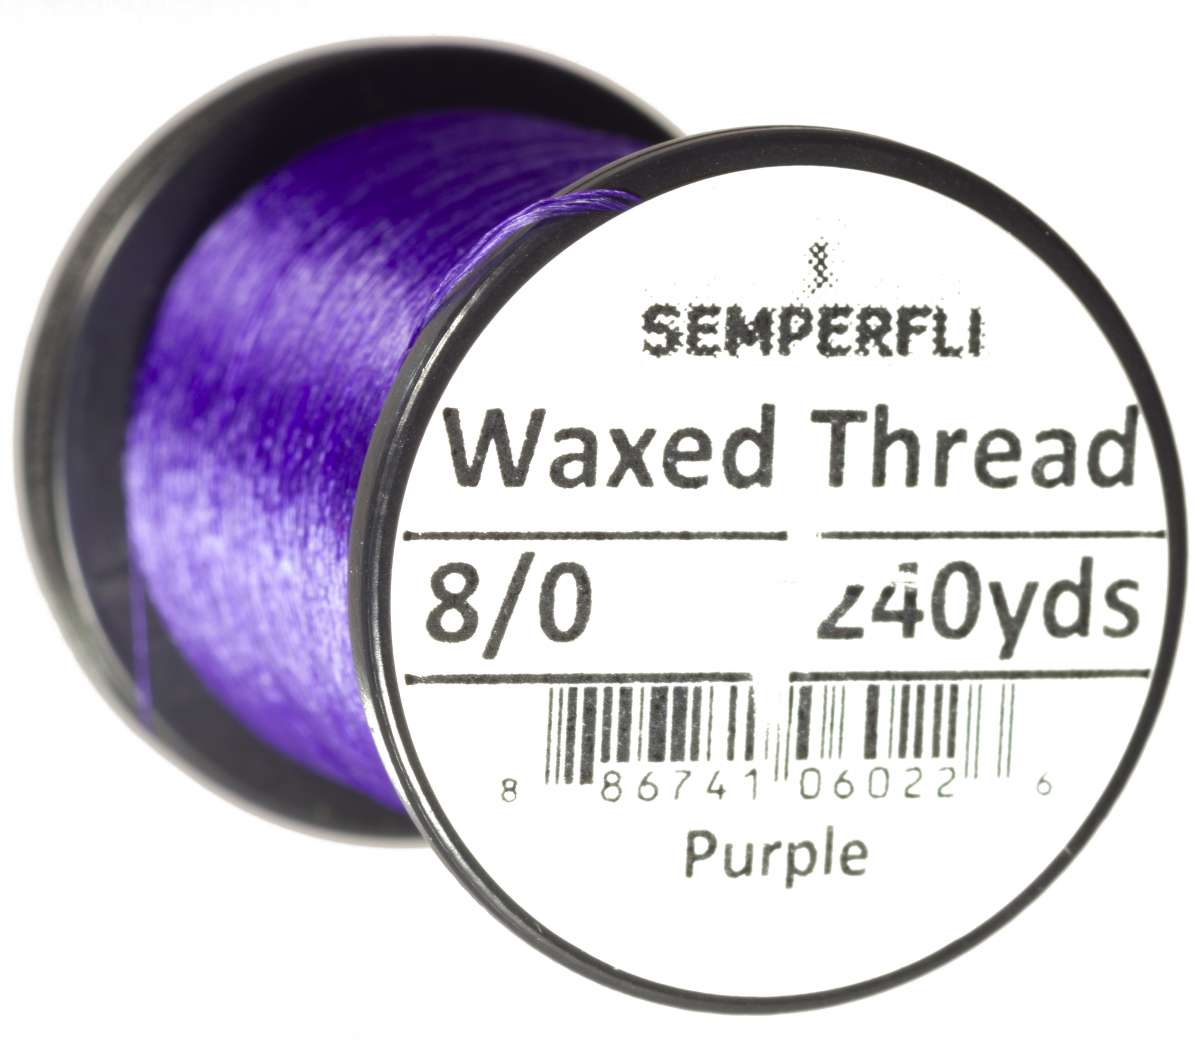 8/0 Classic Waxed Thread Purple Sem-0400-1753 (2)